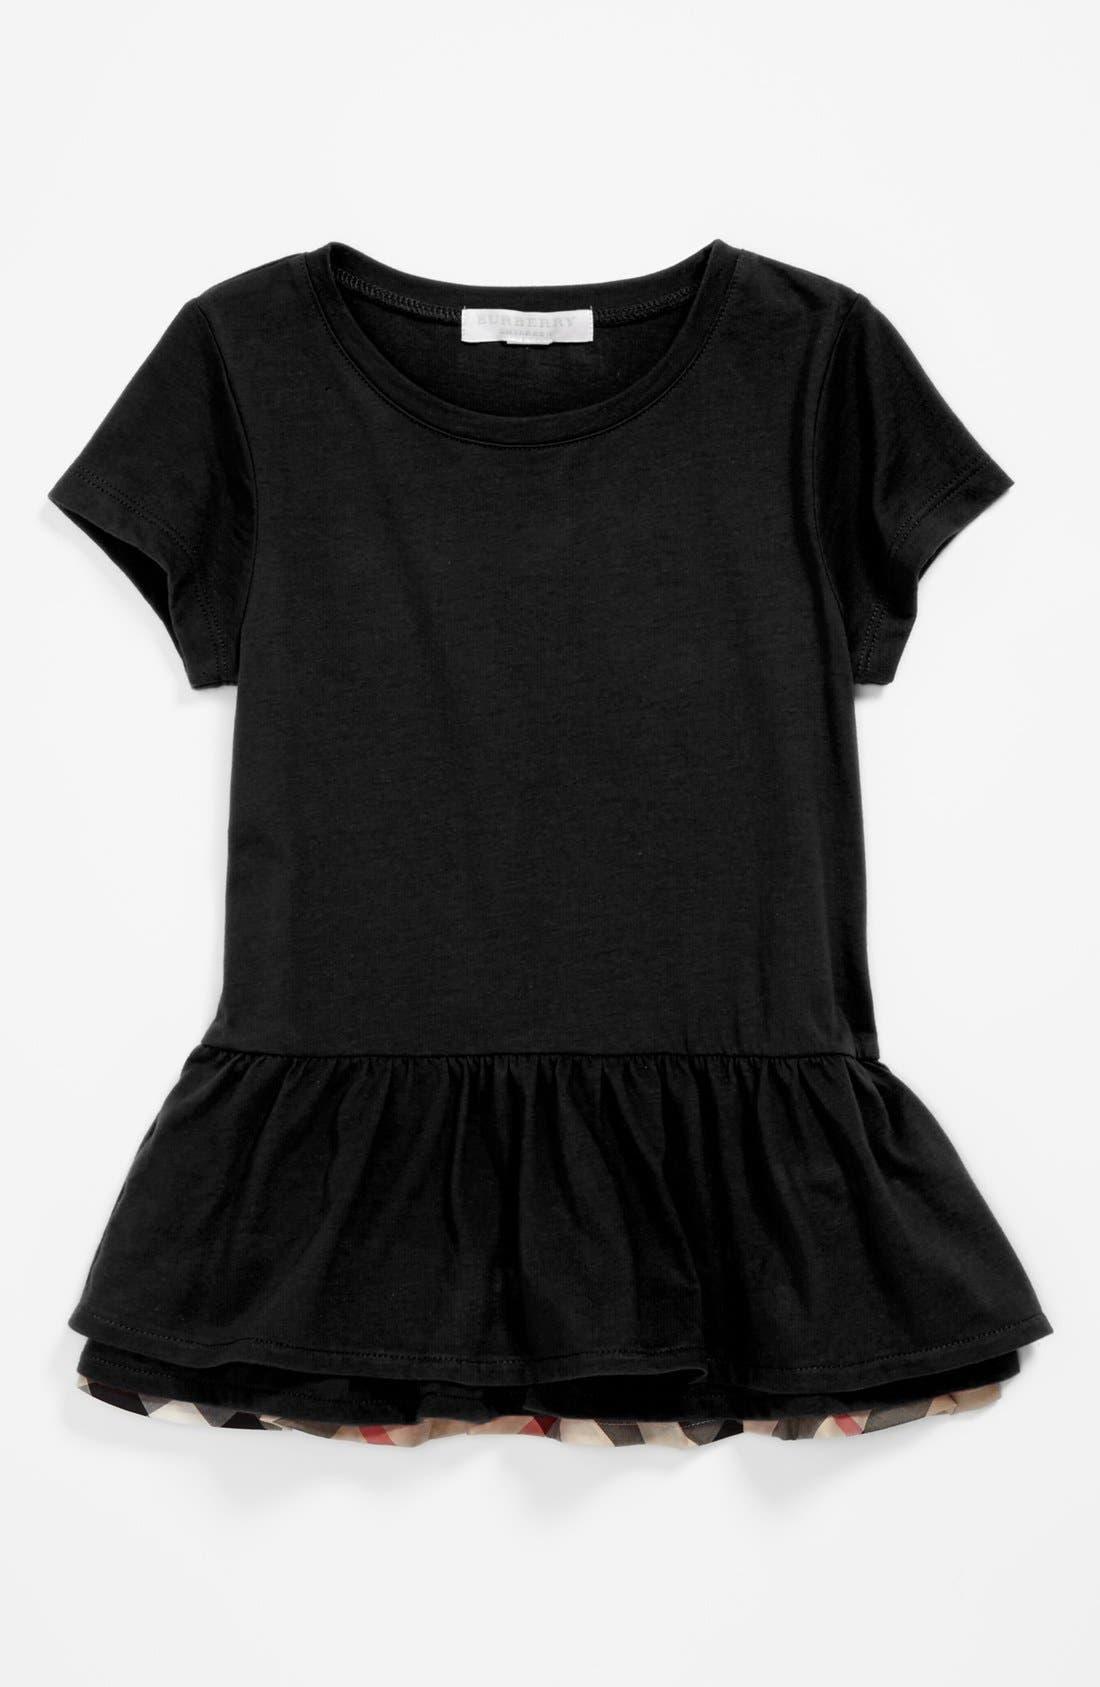 Alternate Image 1 Selected - Burberry 'Tyna' Tiered Ruffle Hem Top (Toddler Girls, Little Girls & Big Girls)